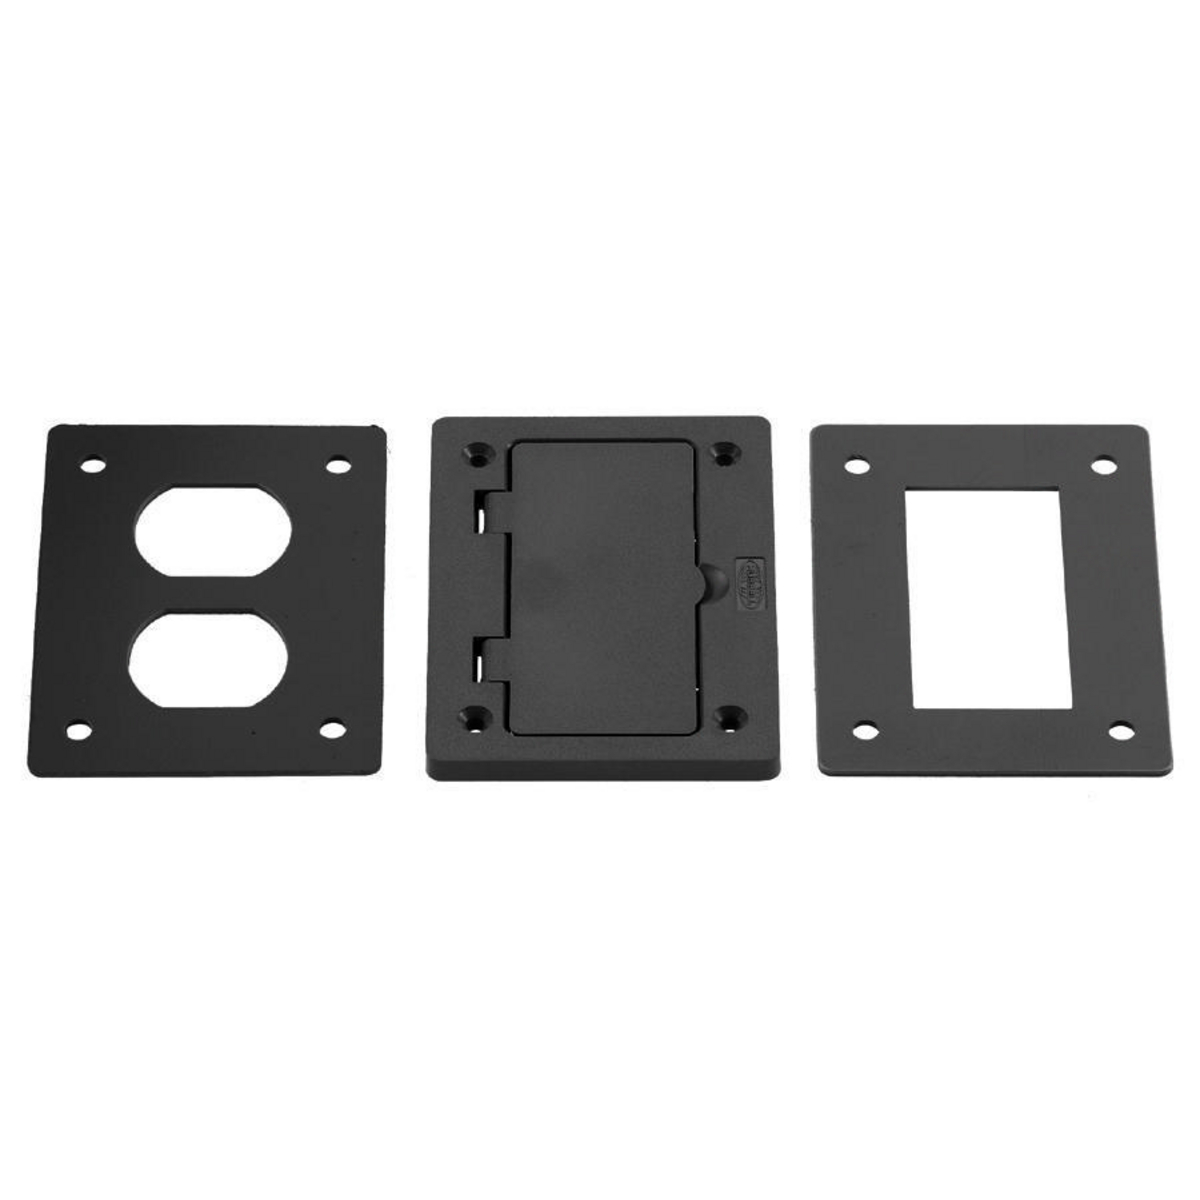 Hubbell PFBR826BLA 4.15 x 2.97 Inch Black Non-Metallic Rectangular Floor Box Cover